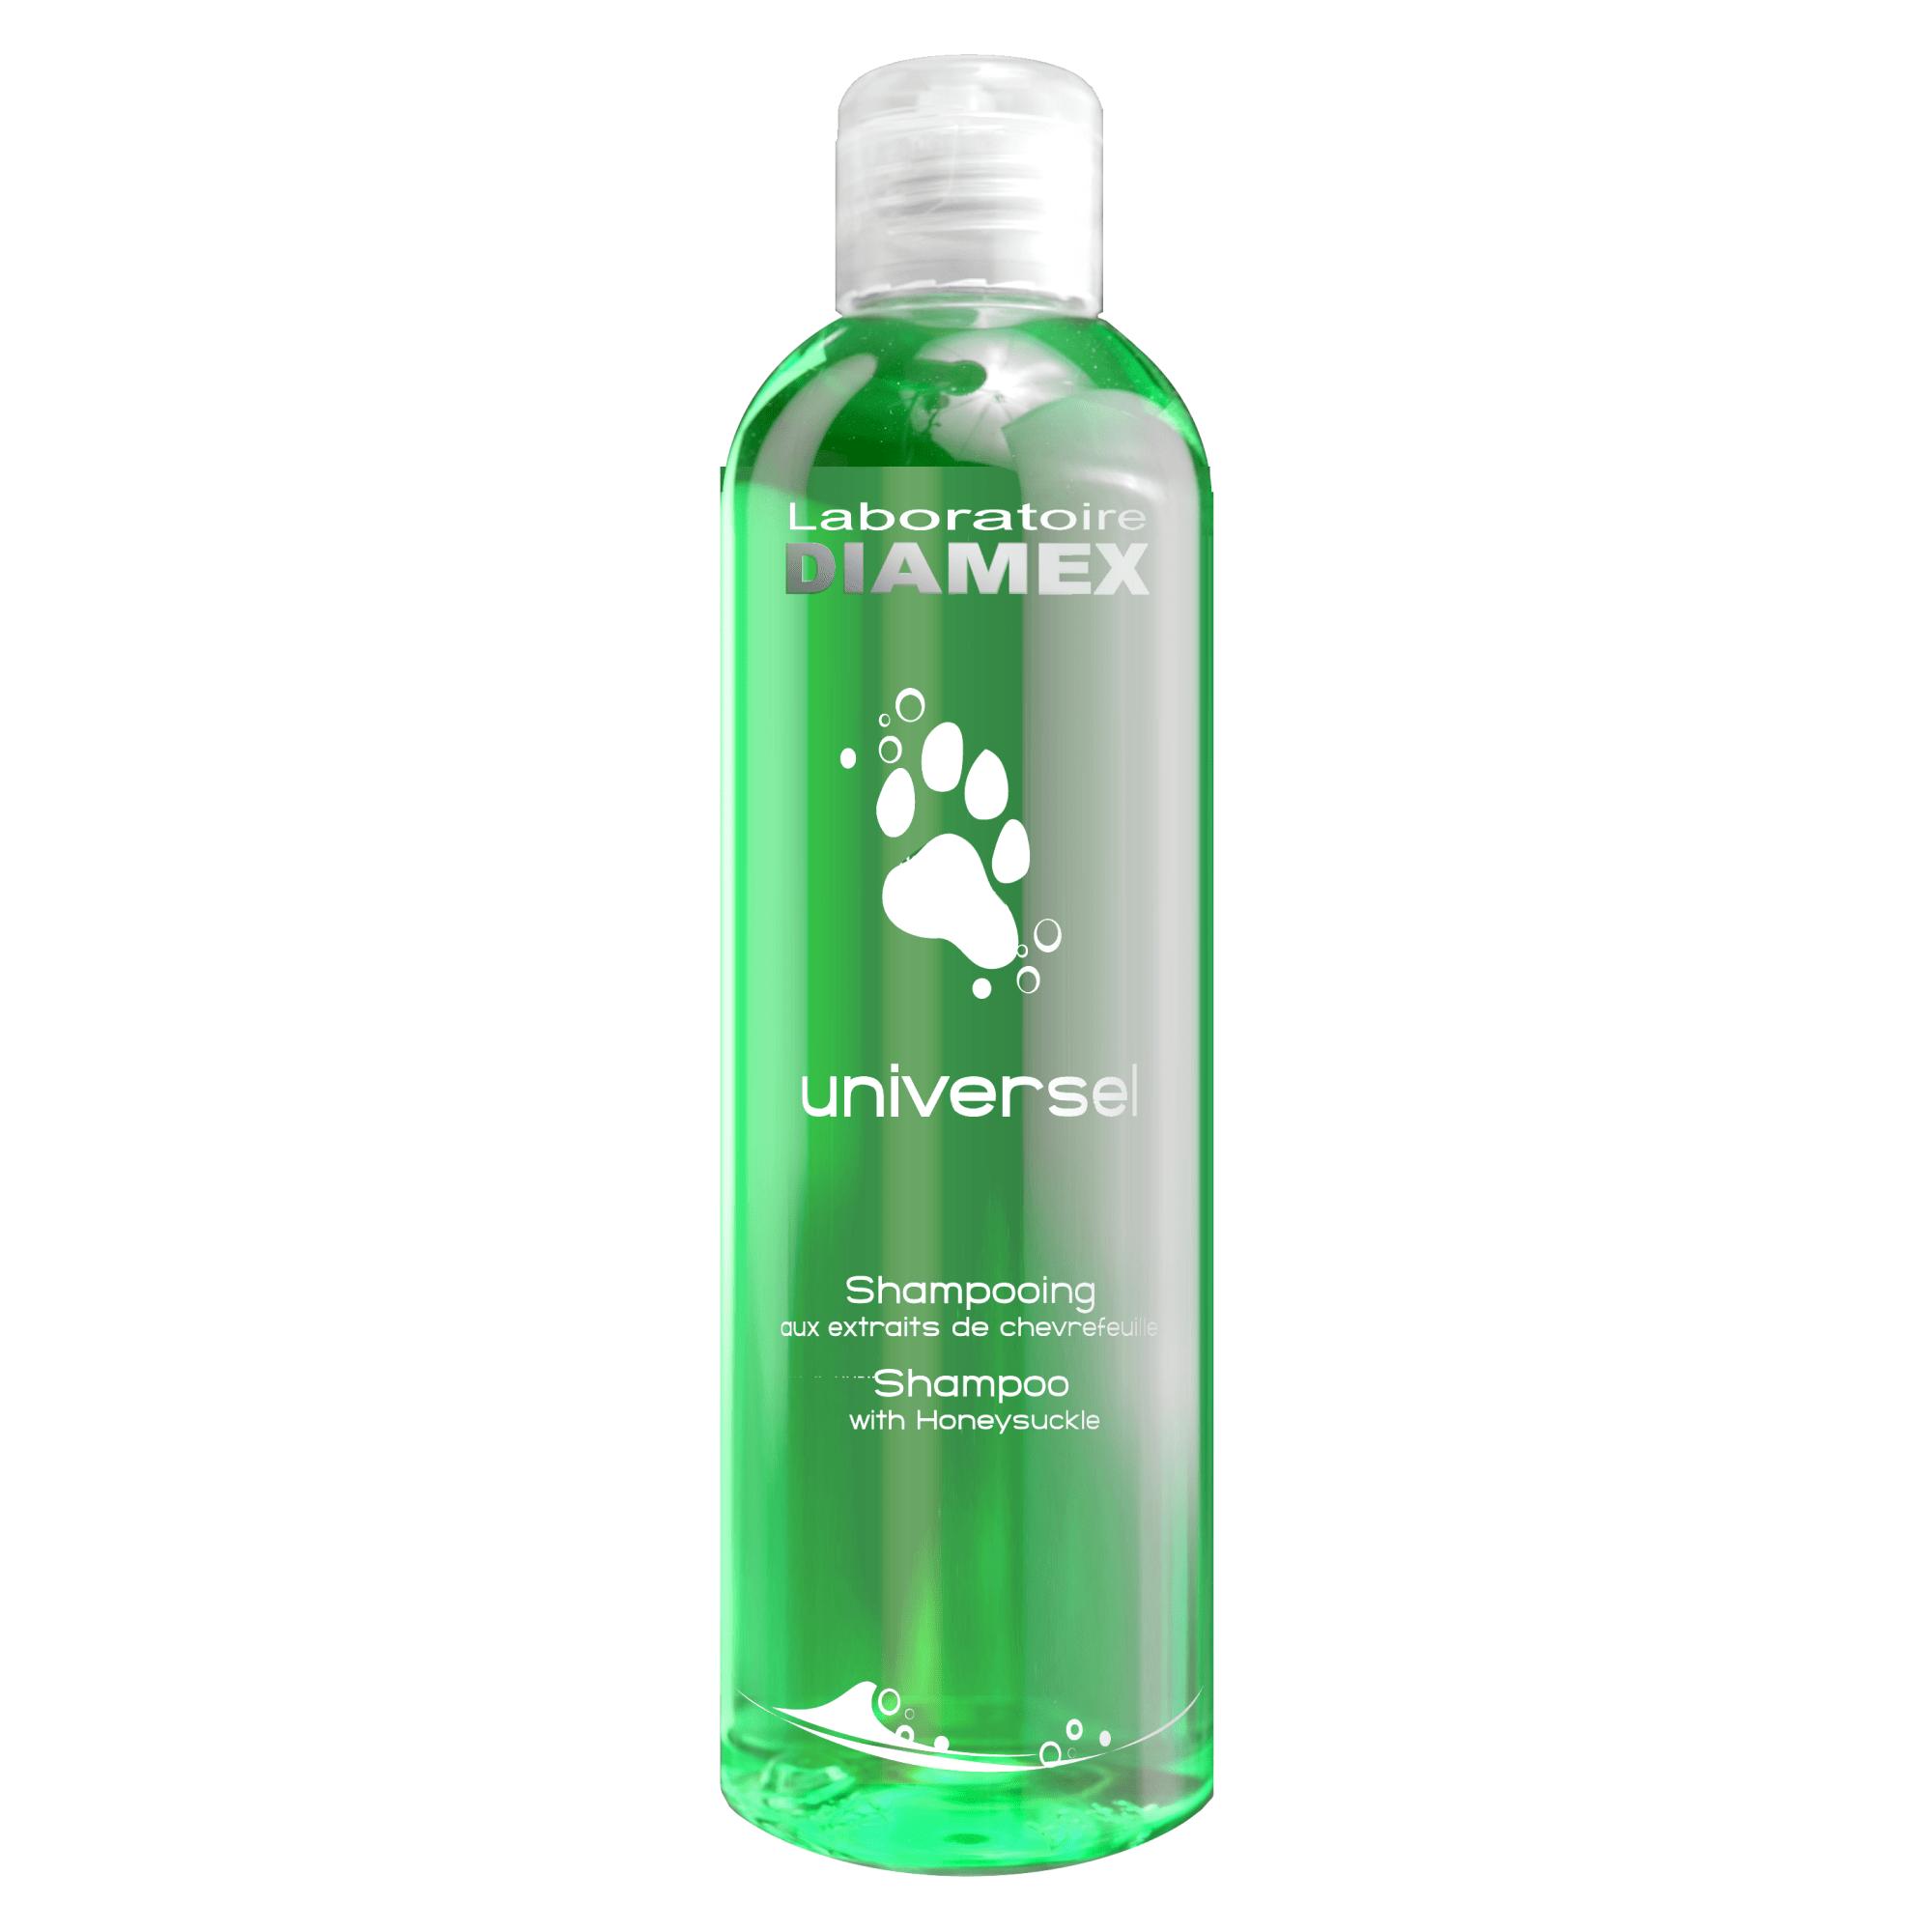 Diamex universele Chevrefeuille shampoo